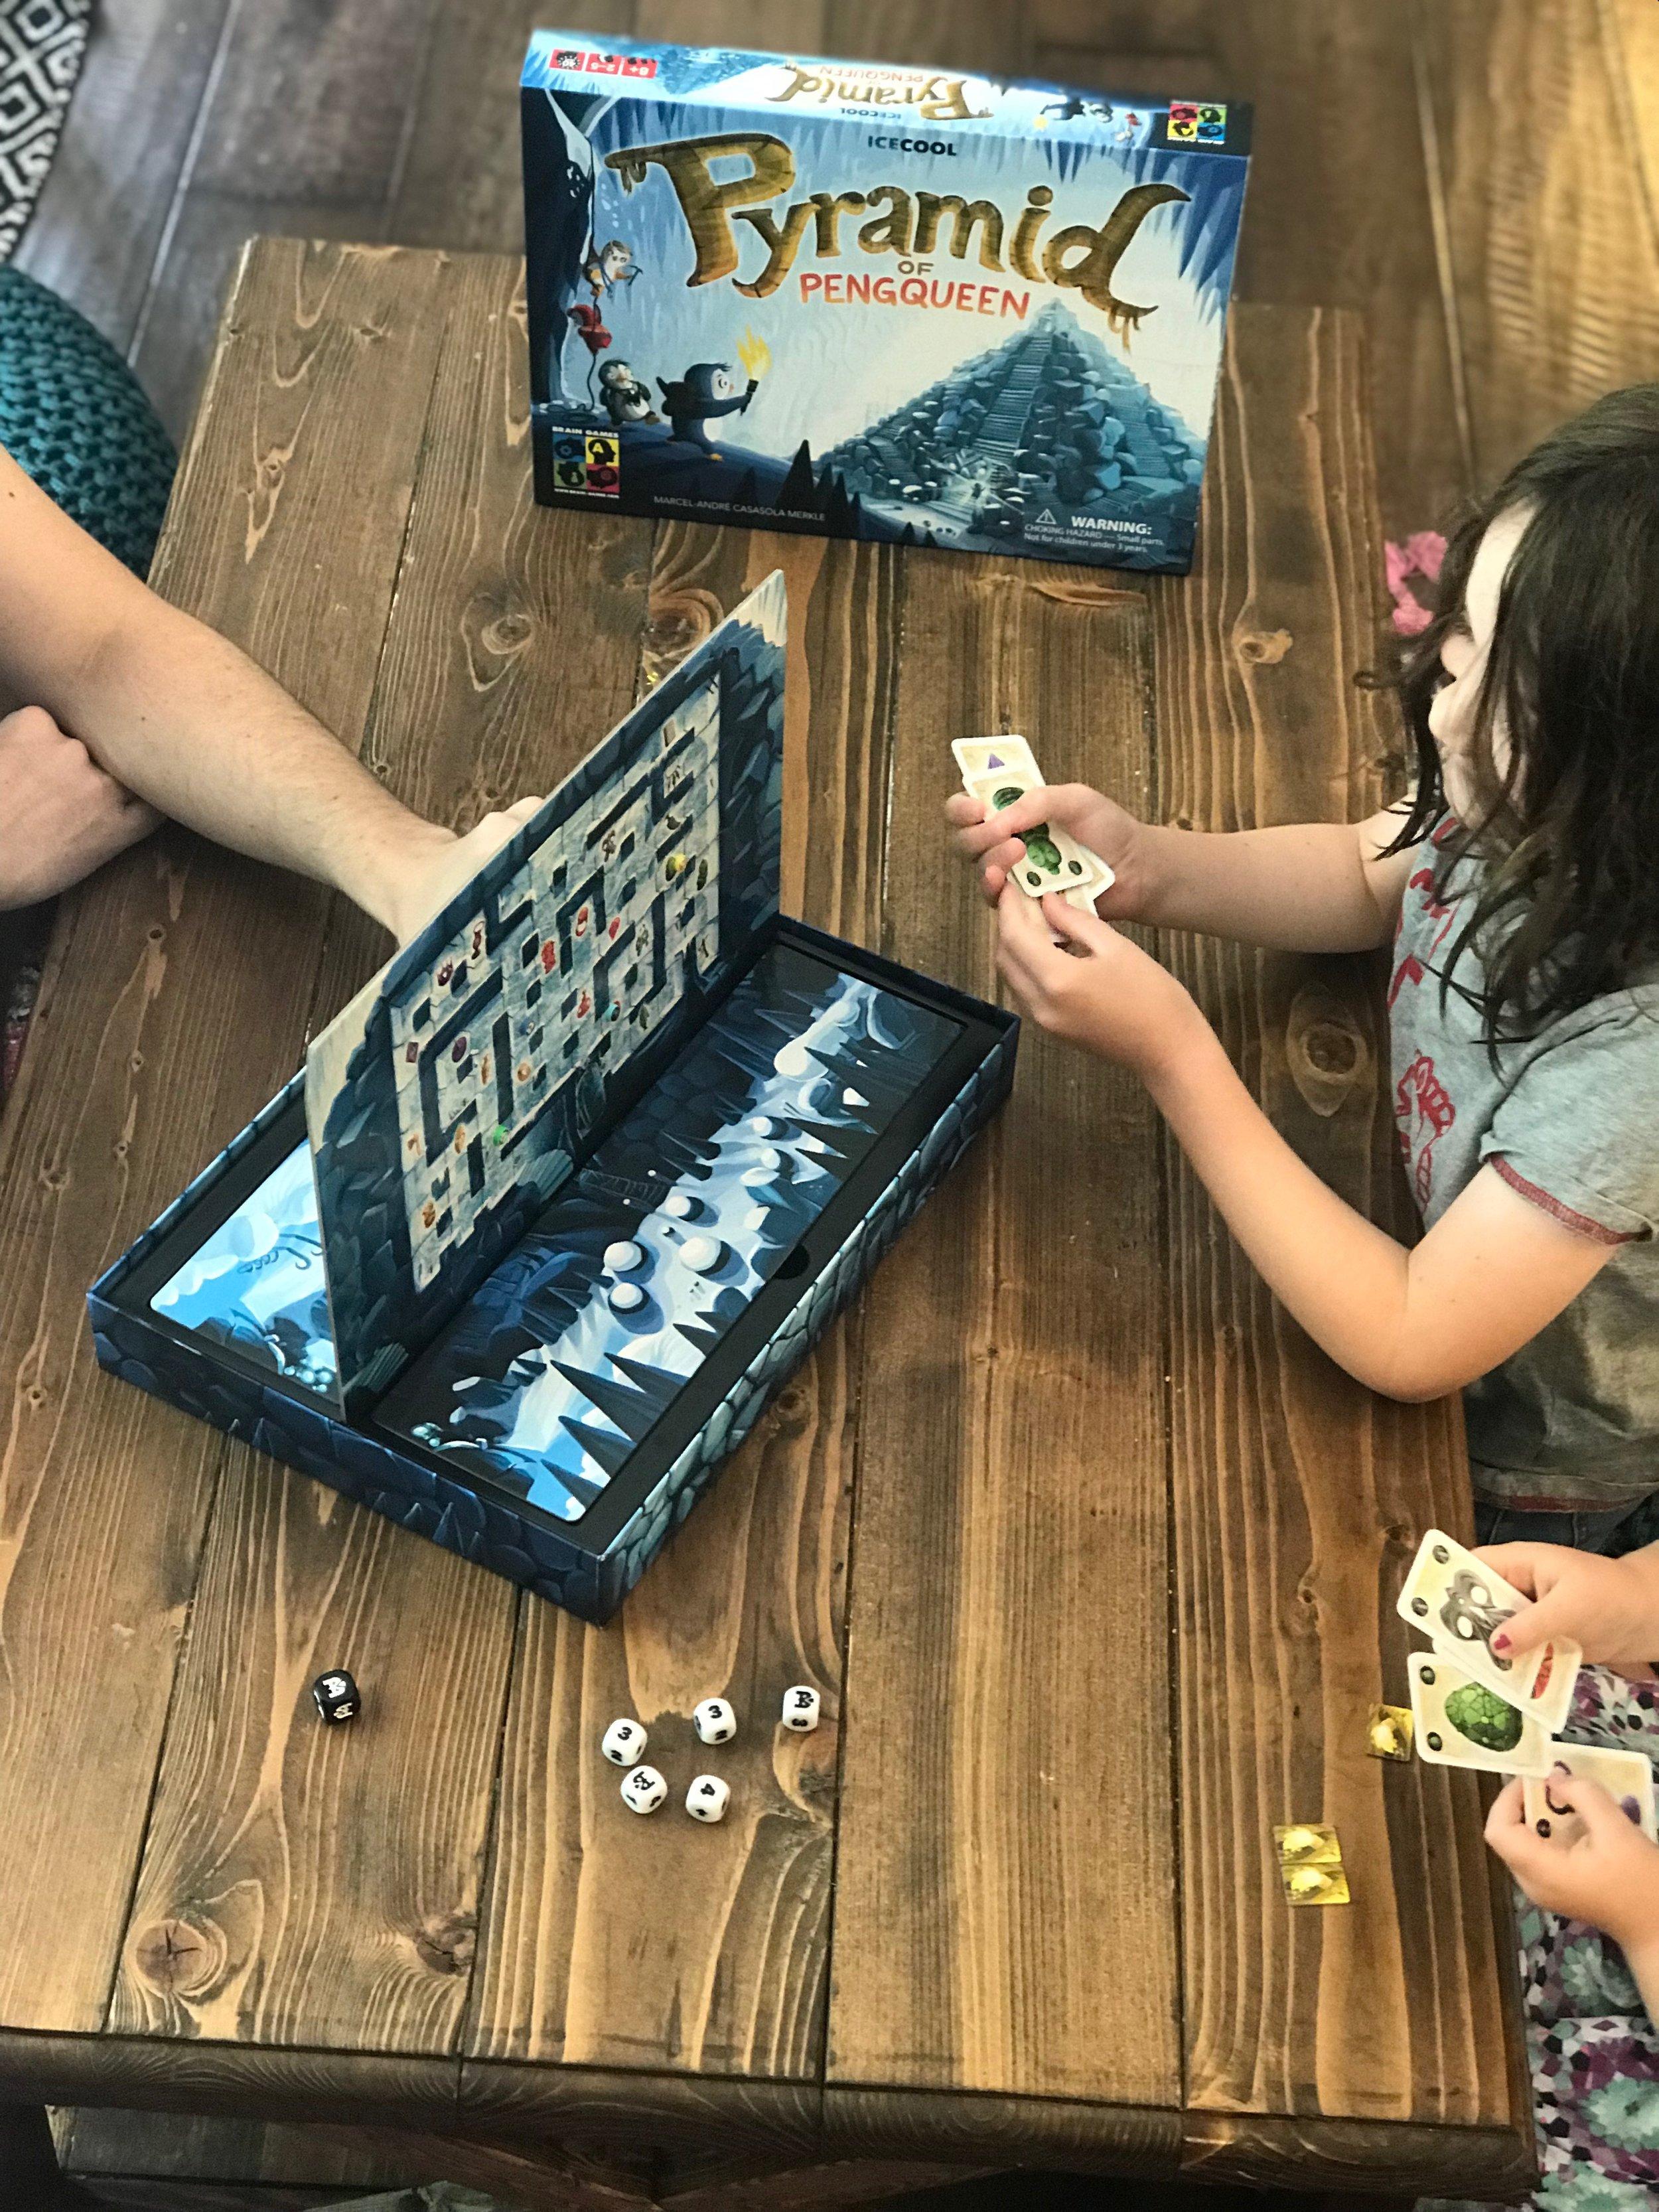 pyramid of pengqueen board game.jpeg